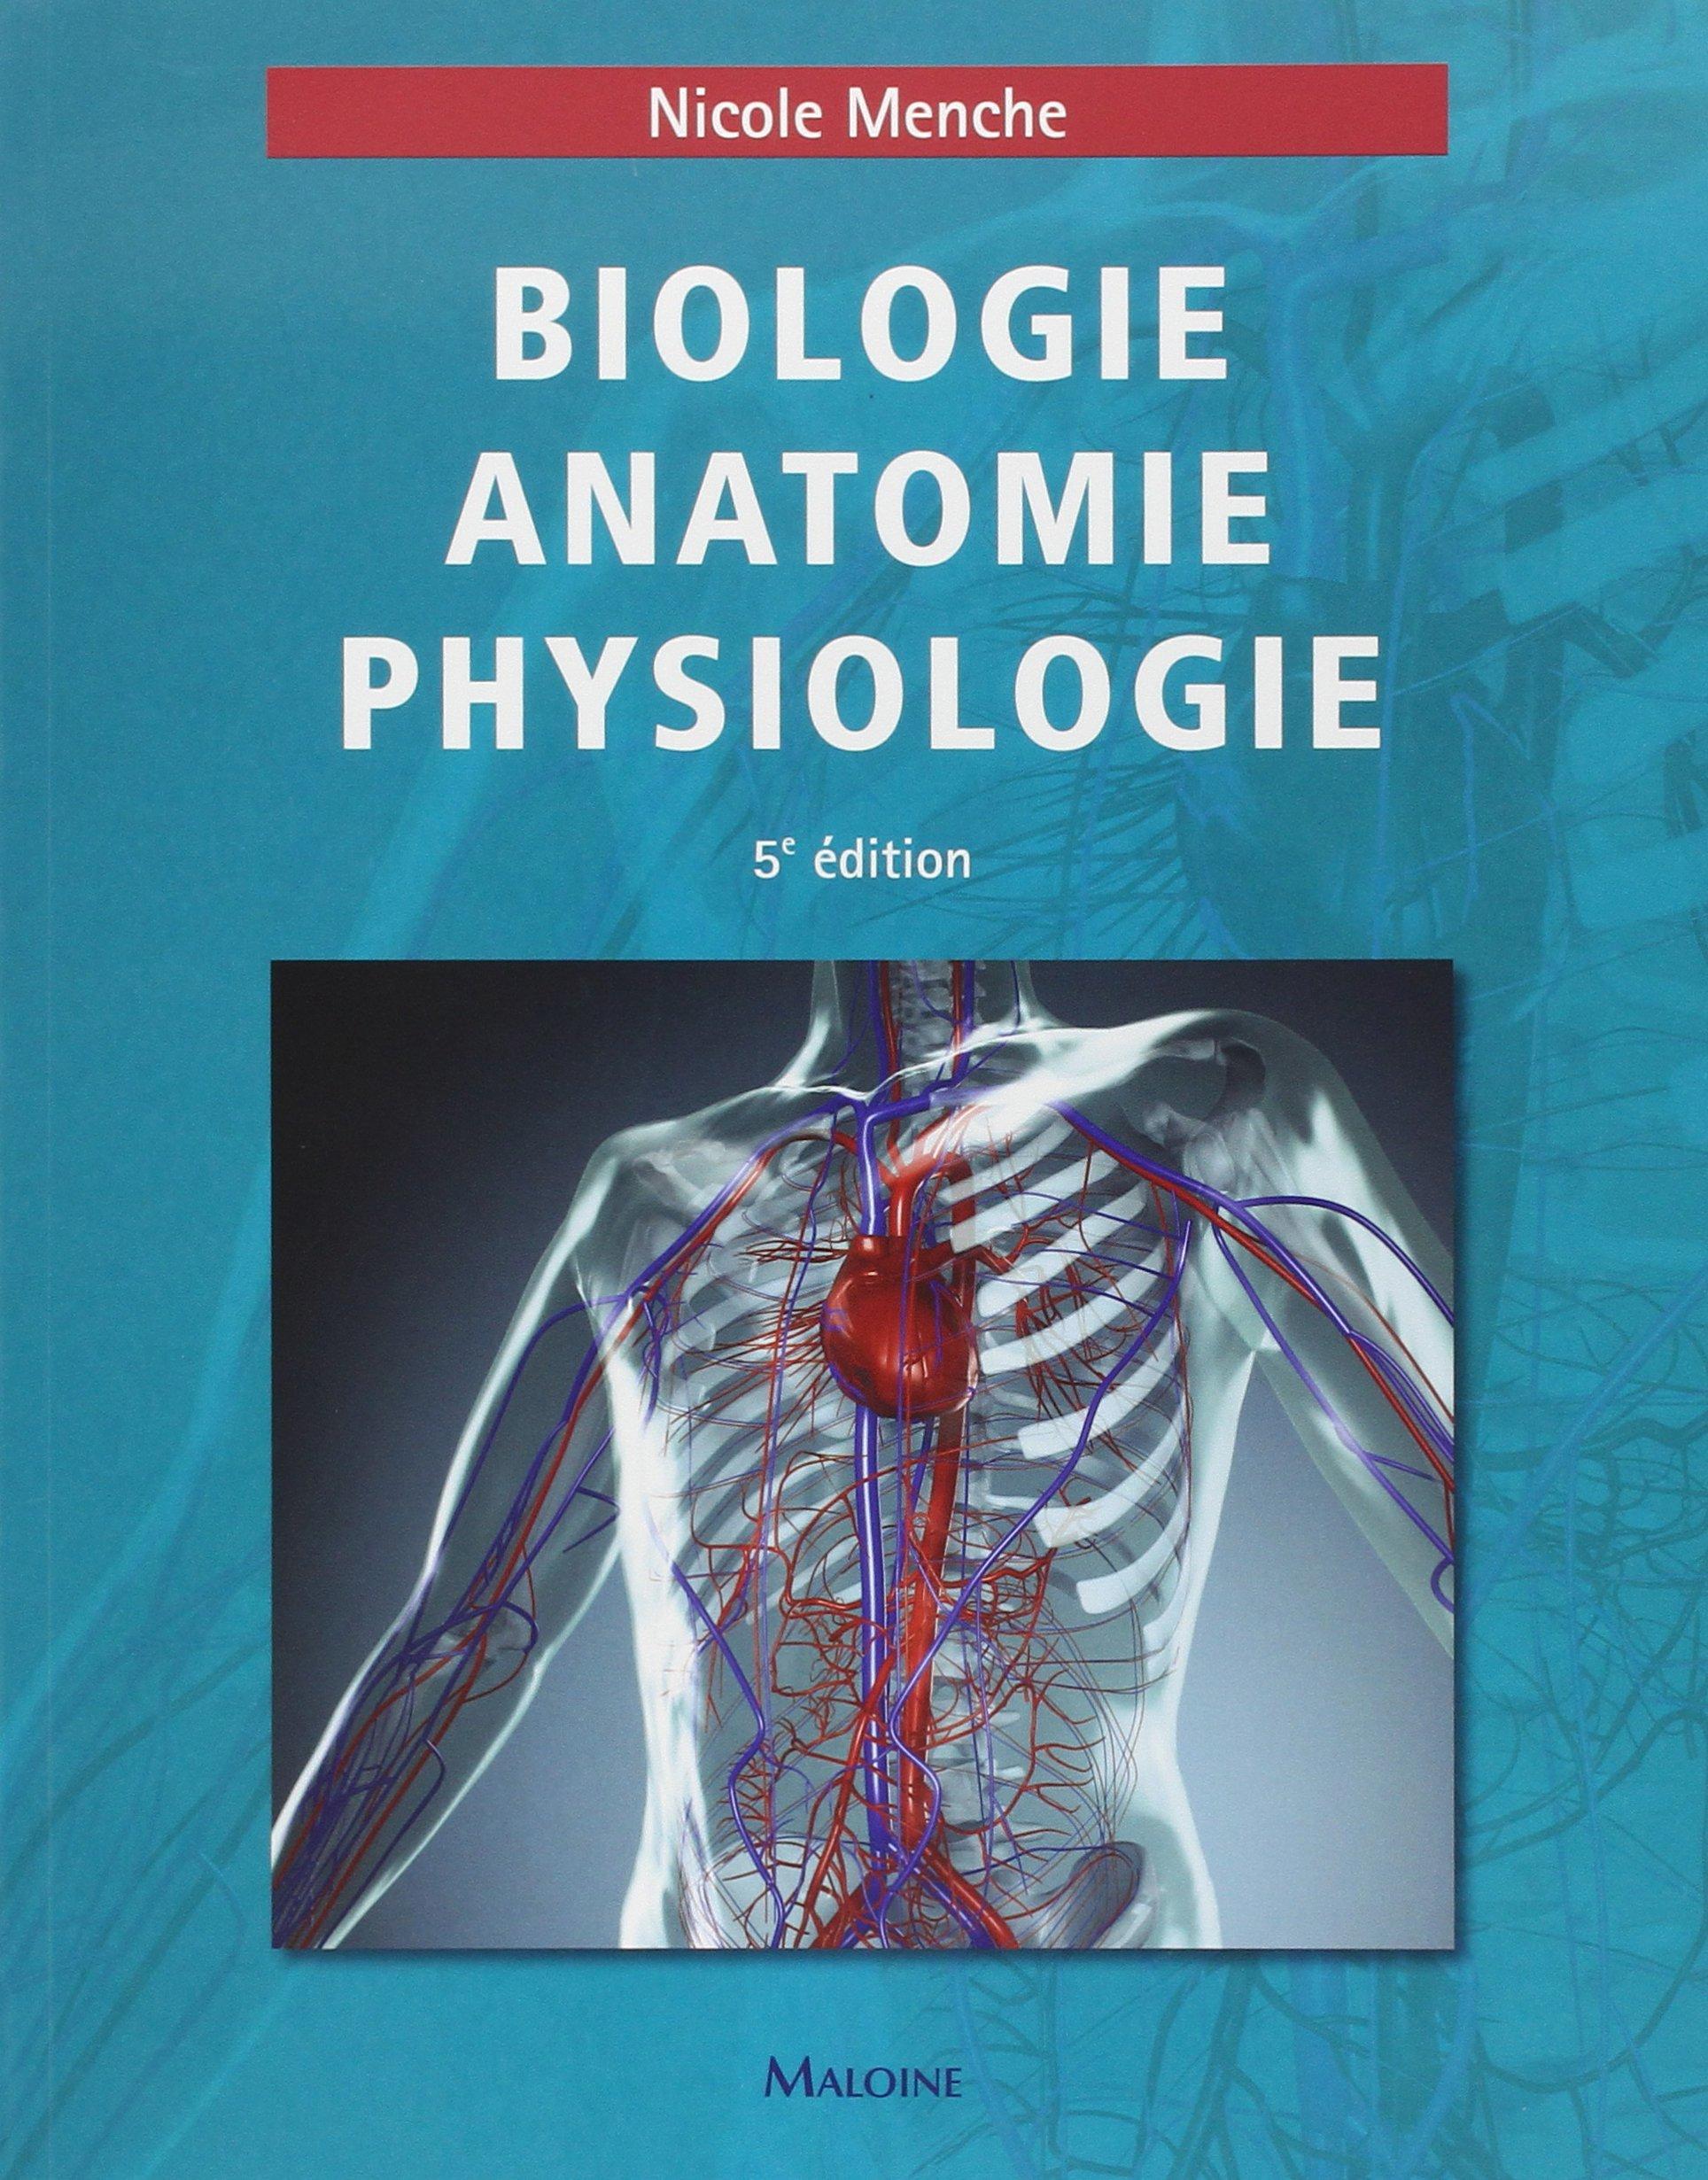 Biologie, Anatomie, Physiologie: Amazon.de: Nicole Menche ...